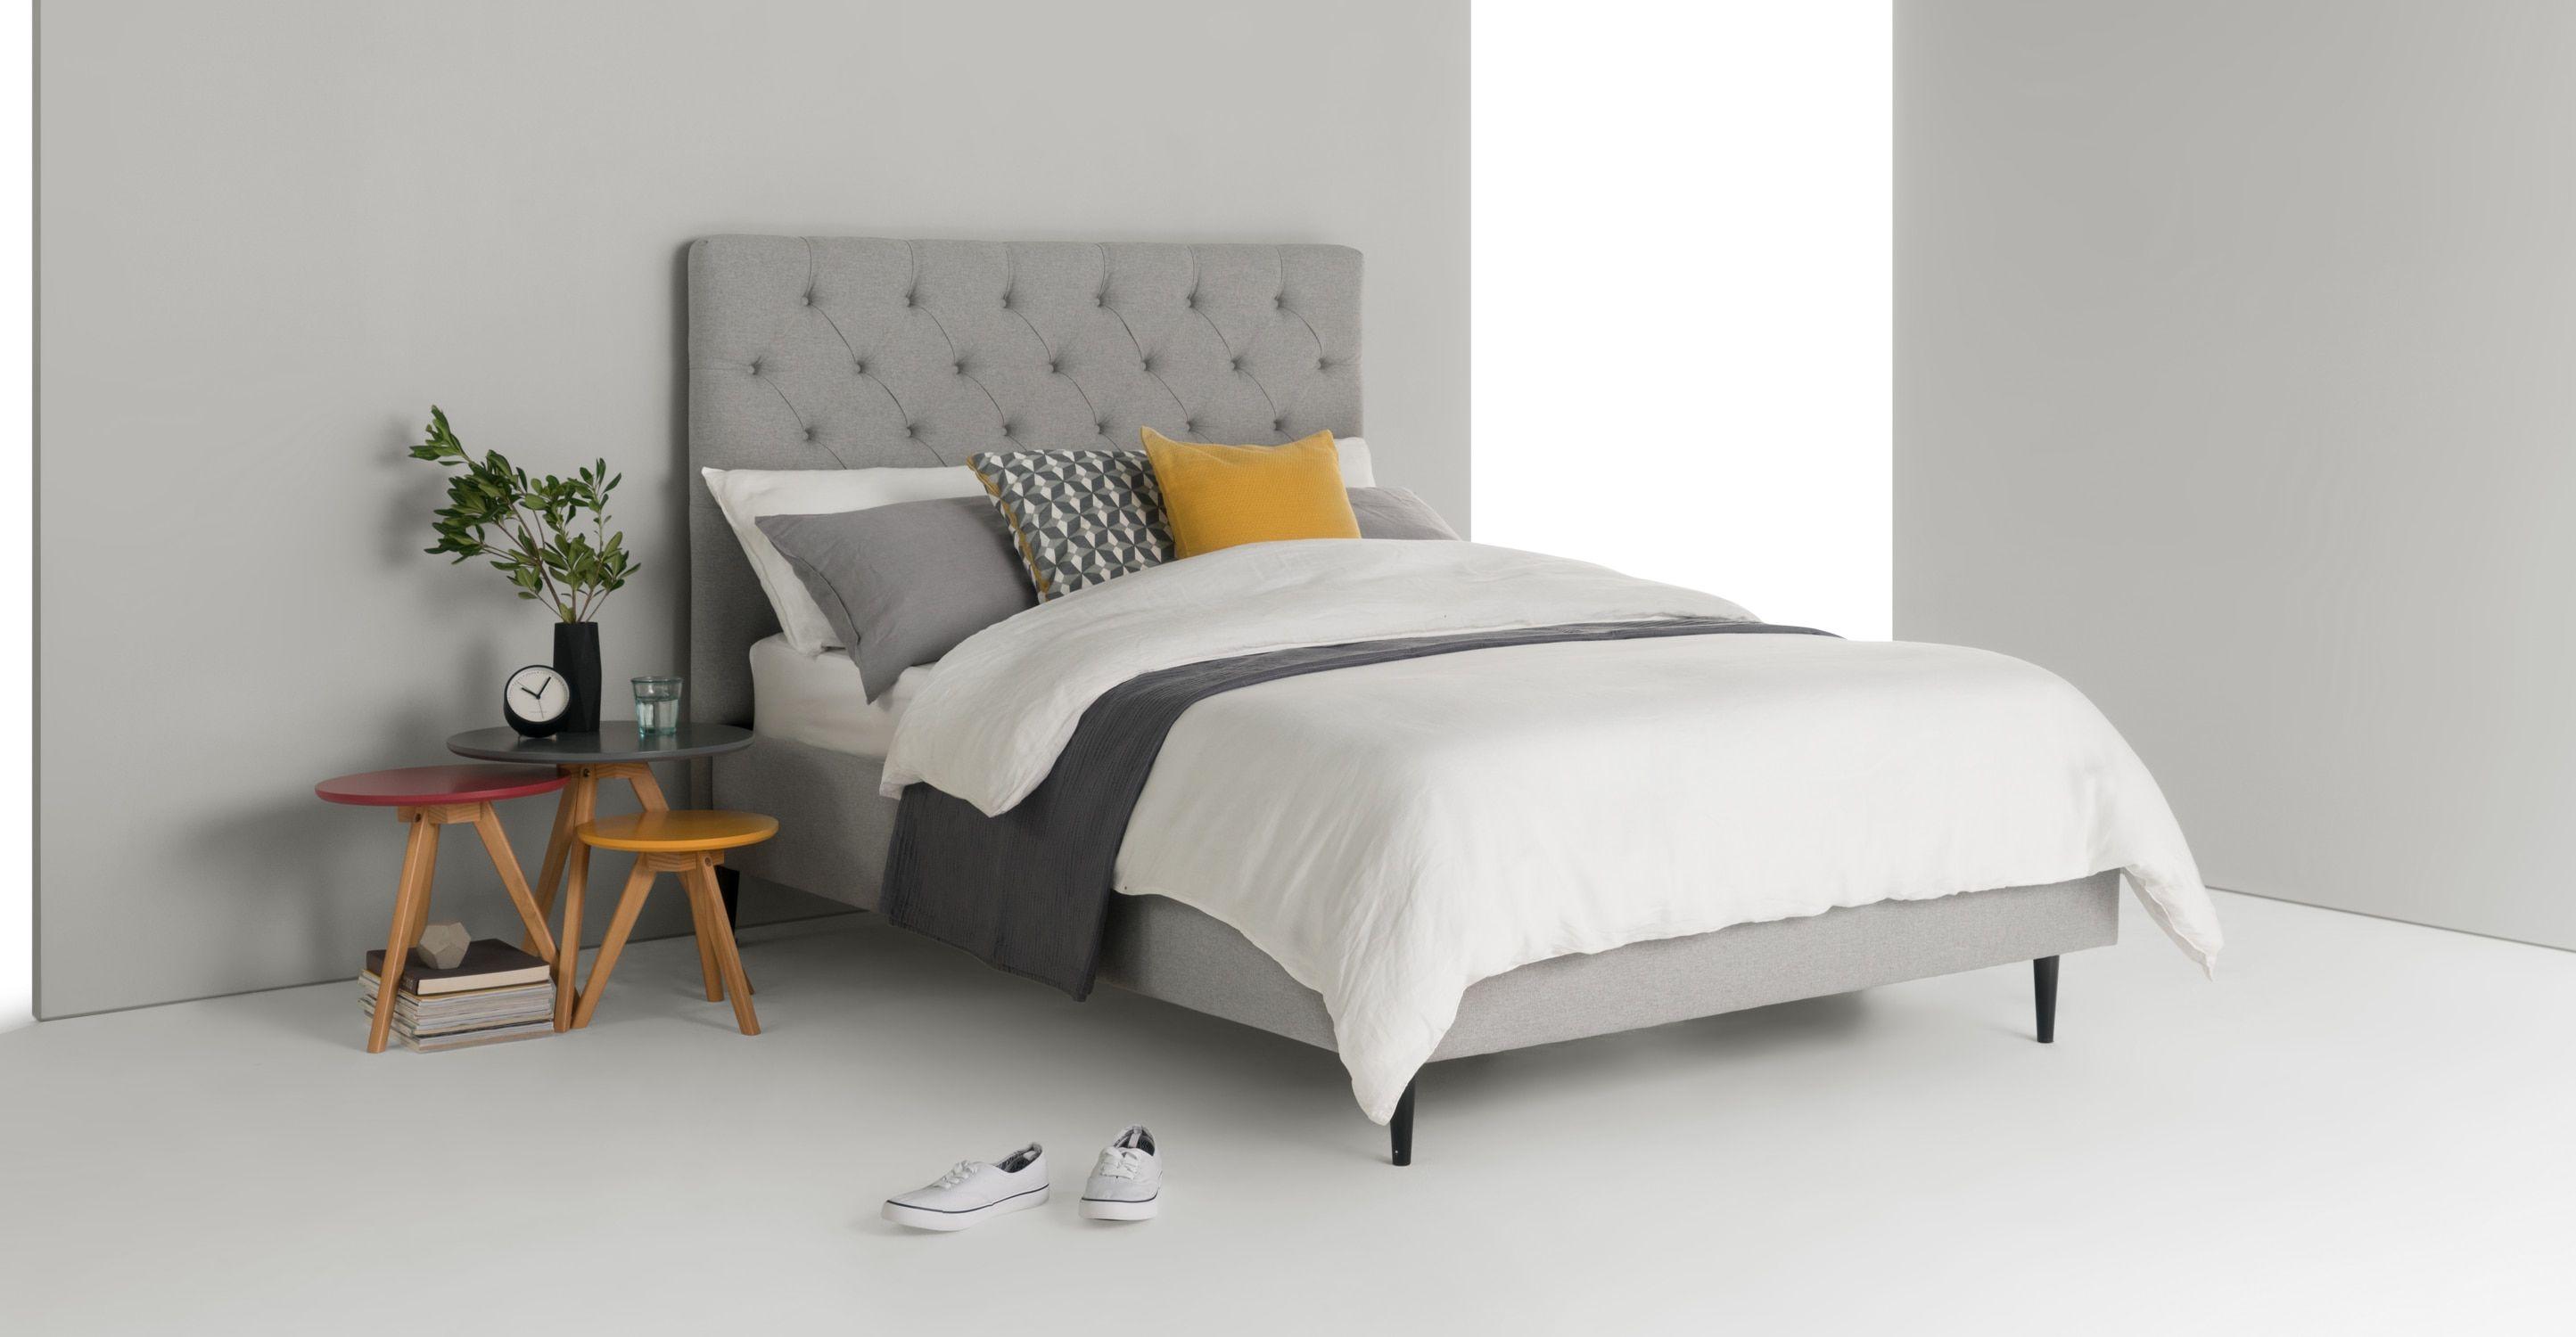 Skye Super King Size Bed Cool Grey Super King Size Bed King